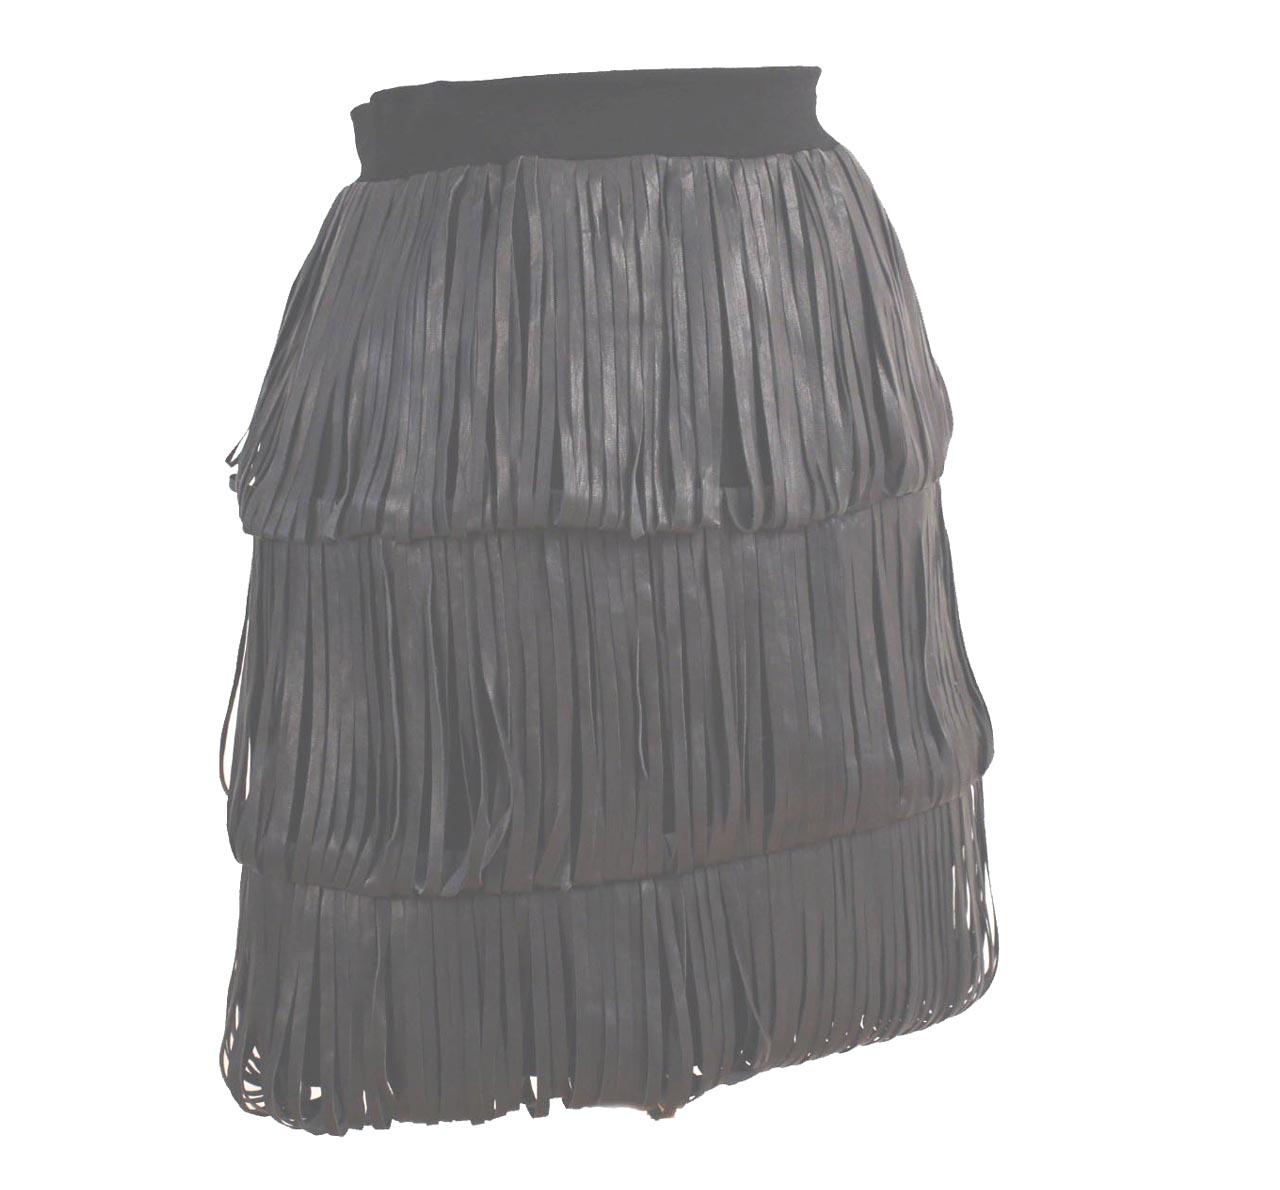 kimberly ovitz elliott black leather strips tiered skirt